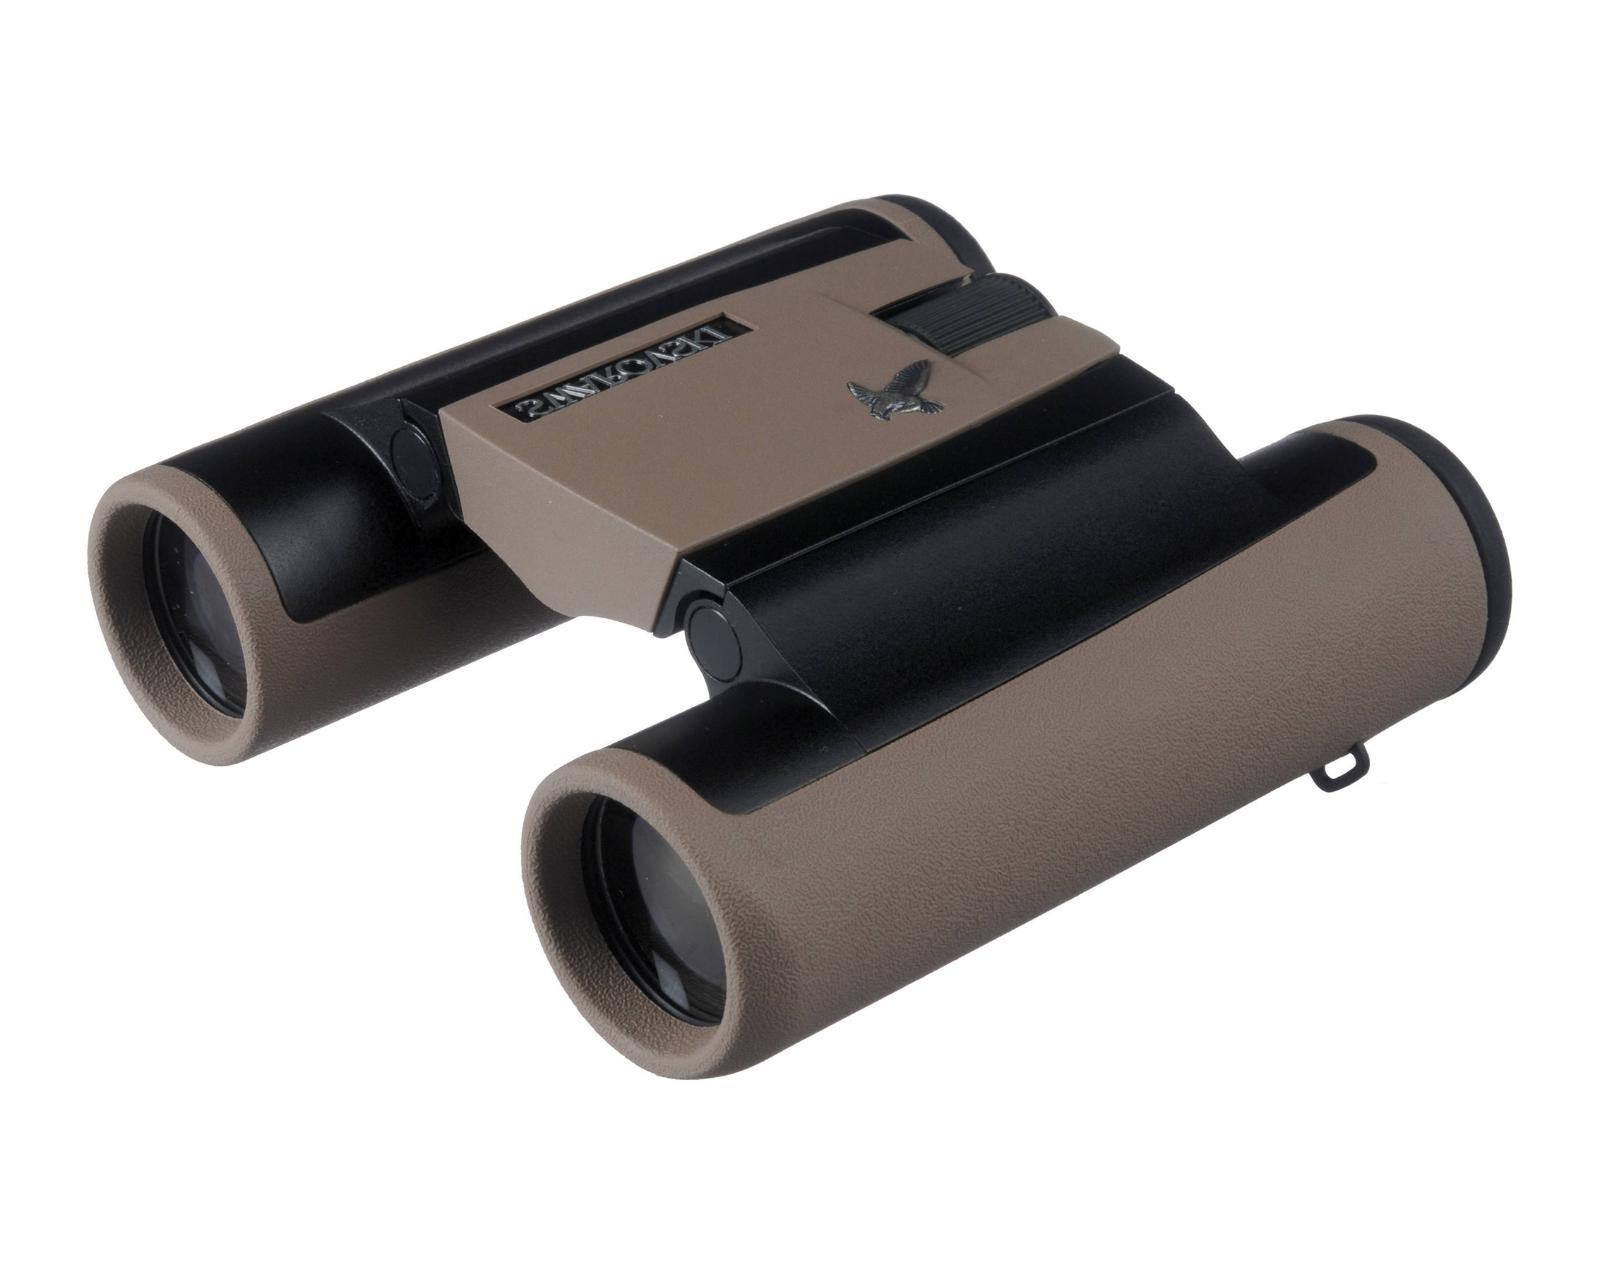 Swarovski Optik CL Pocket Binoculars 8x25 Sand Brown 46202 8